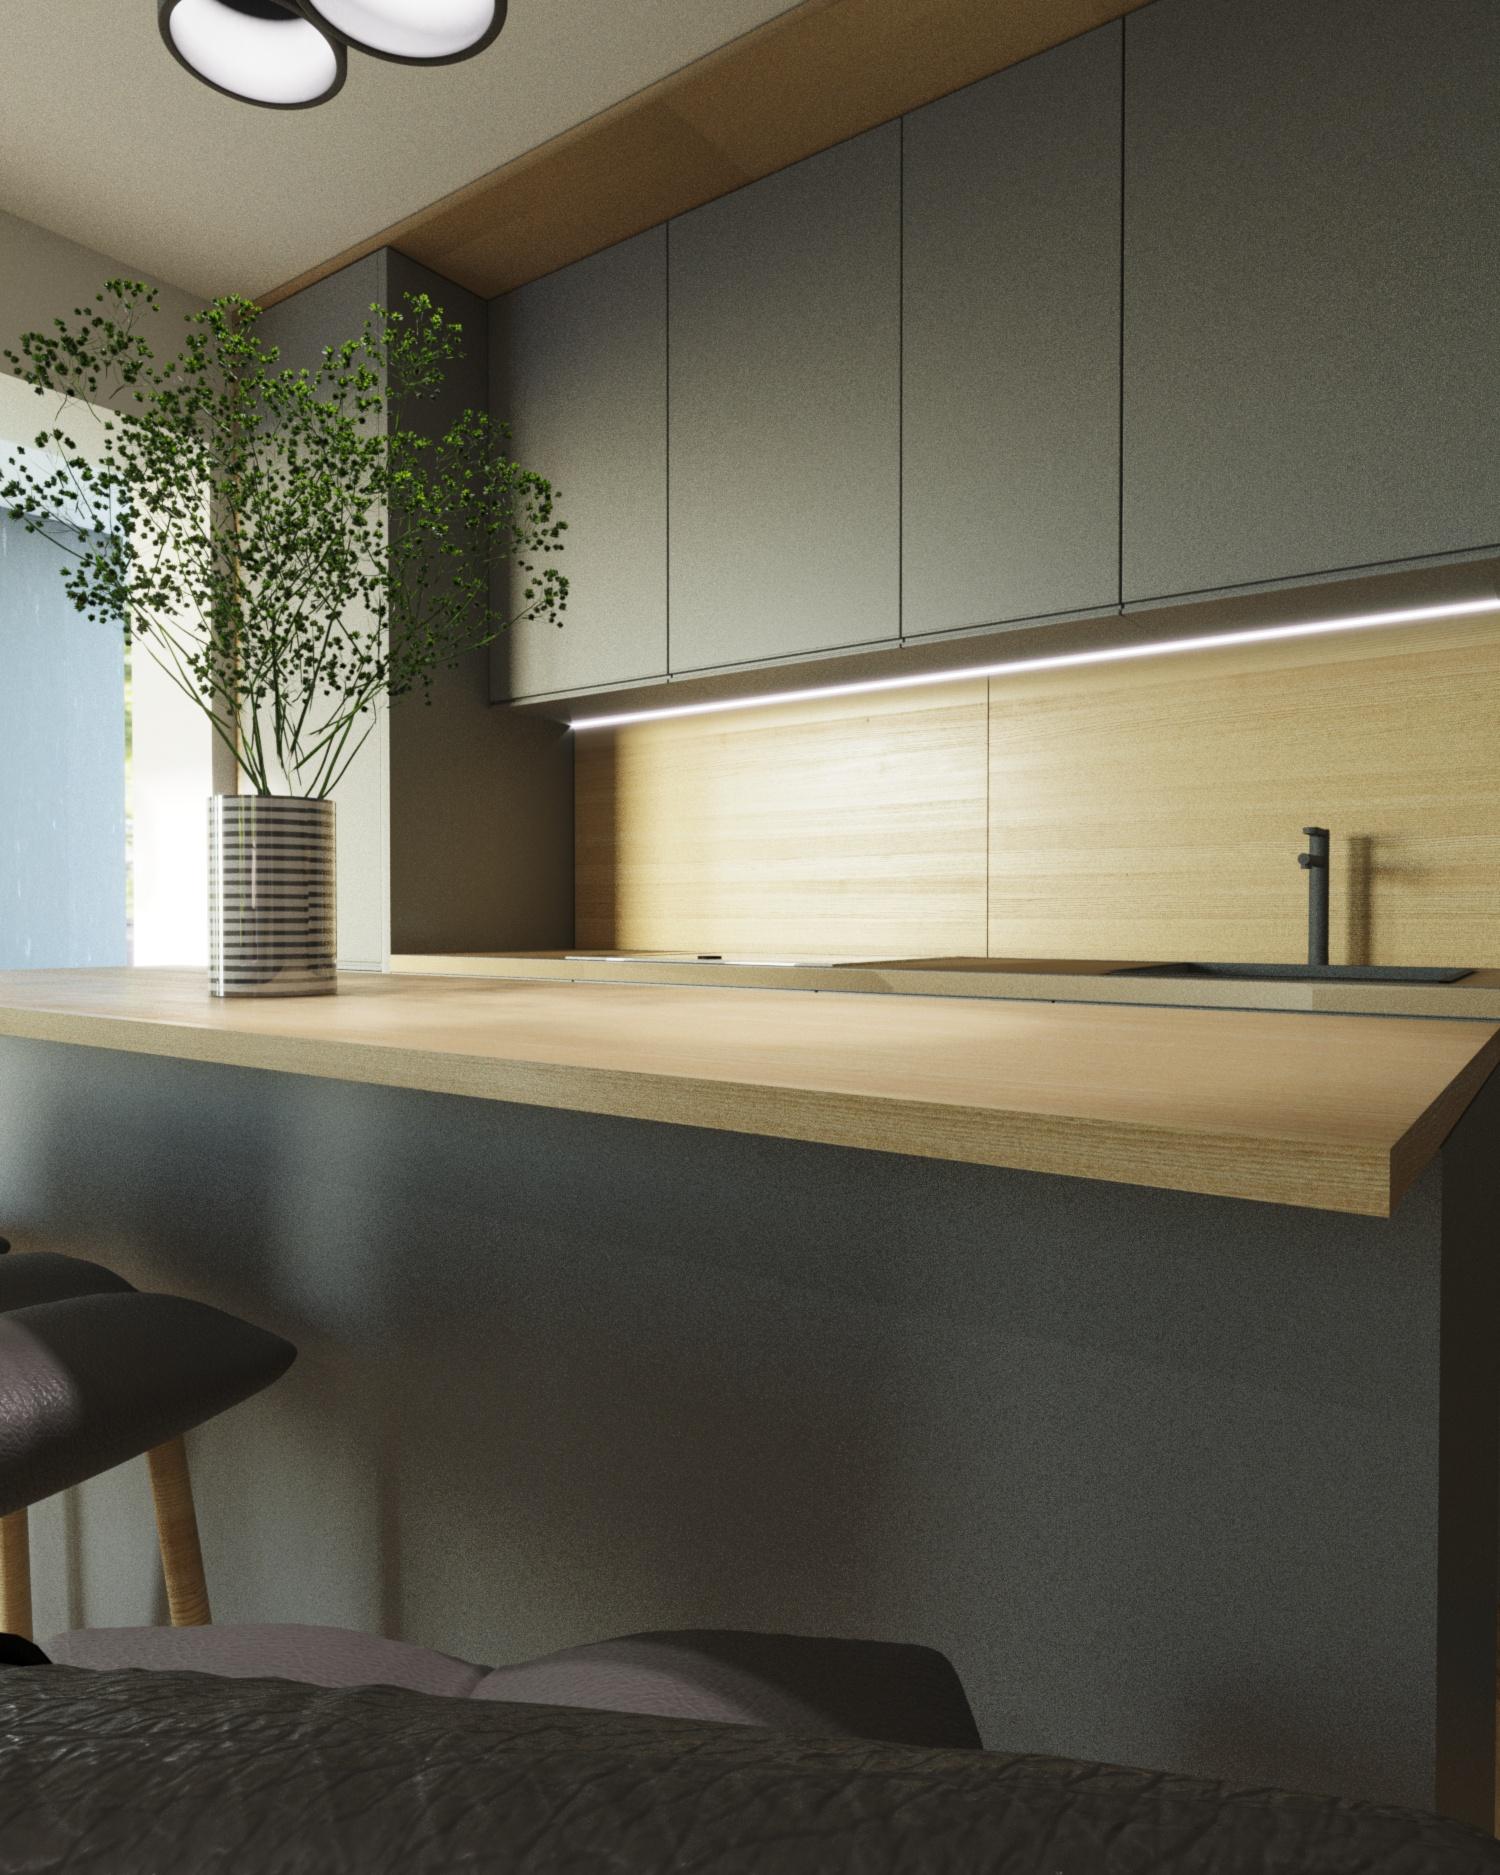 Фото Дизайн интерьера, визуализация в 3D max 5